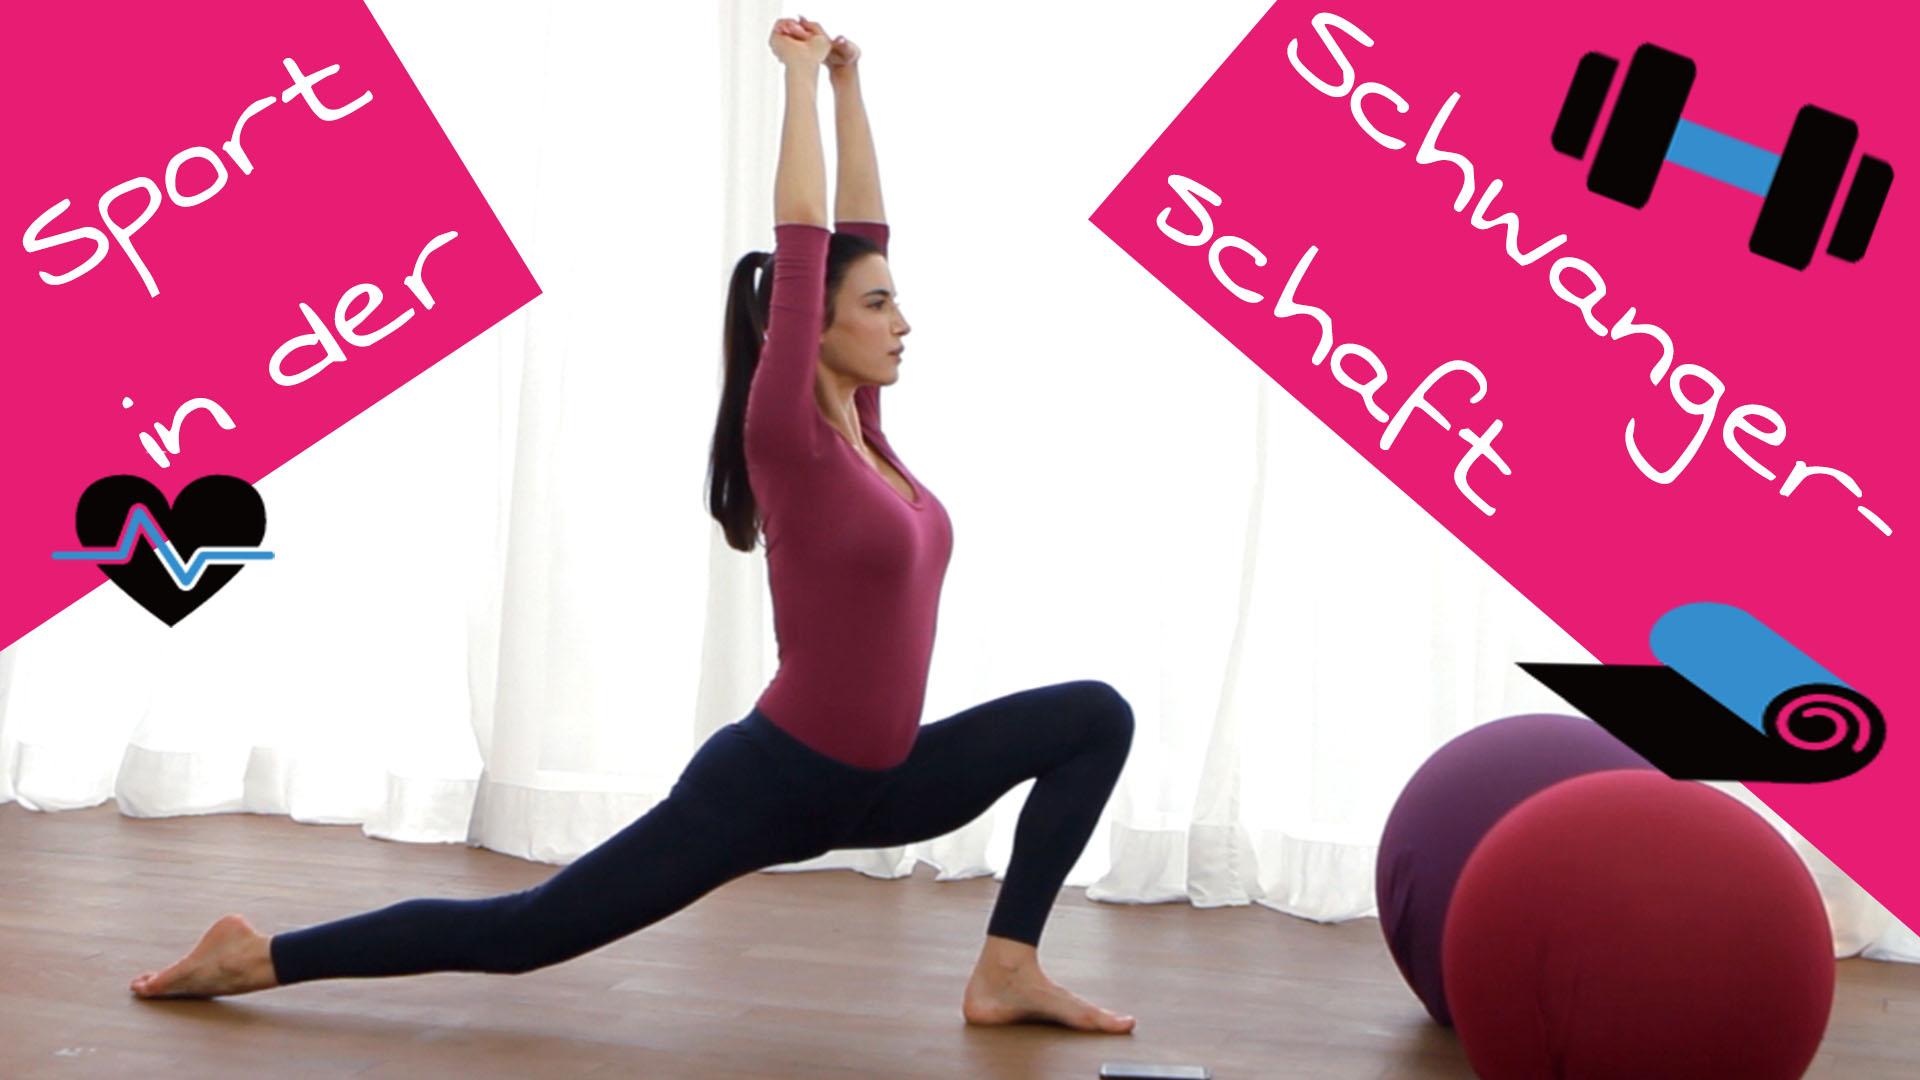 Berühmt Neue Yogalehrer Lebenslaufprobe Galerie - Entry Level Resume ...